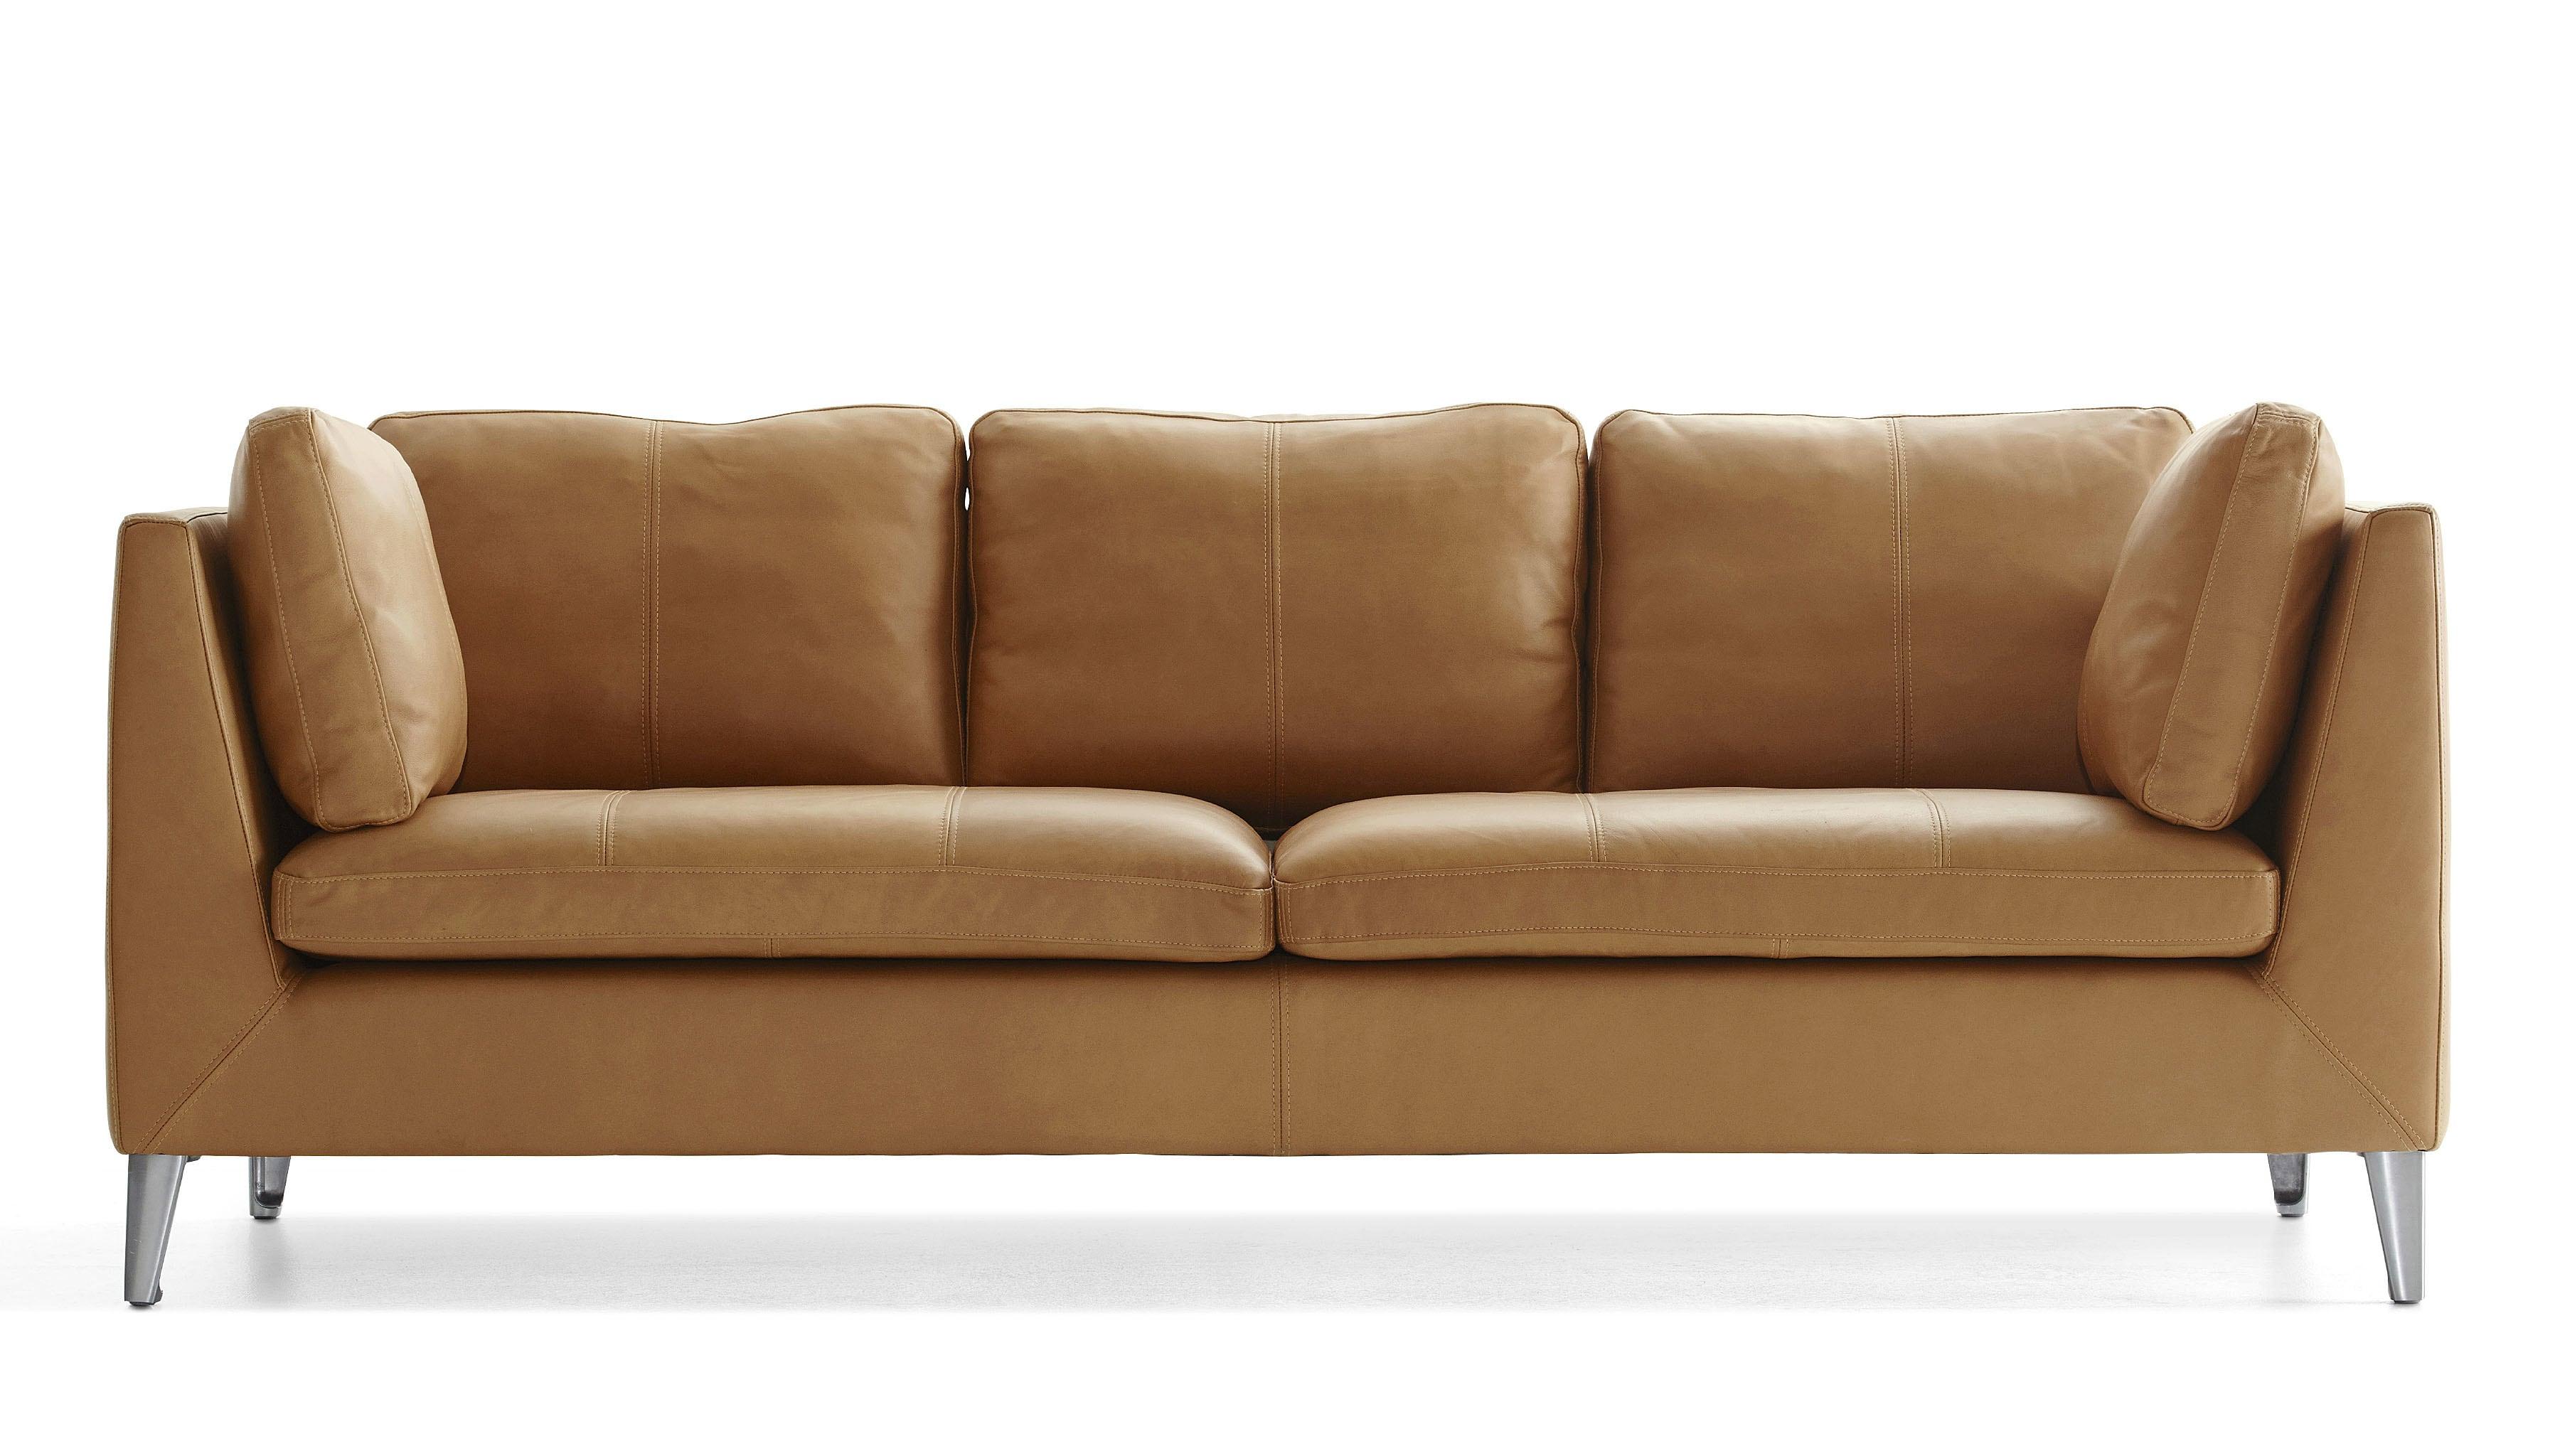 Sofas Baratos Murcia Irdz sofà S Y Sillones Pra Online Ikea